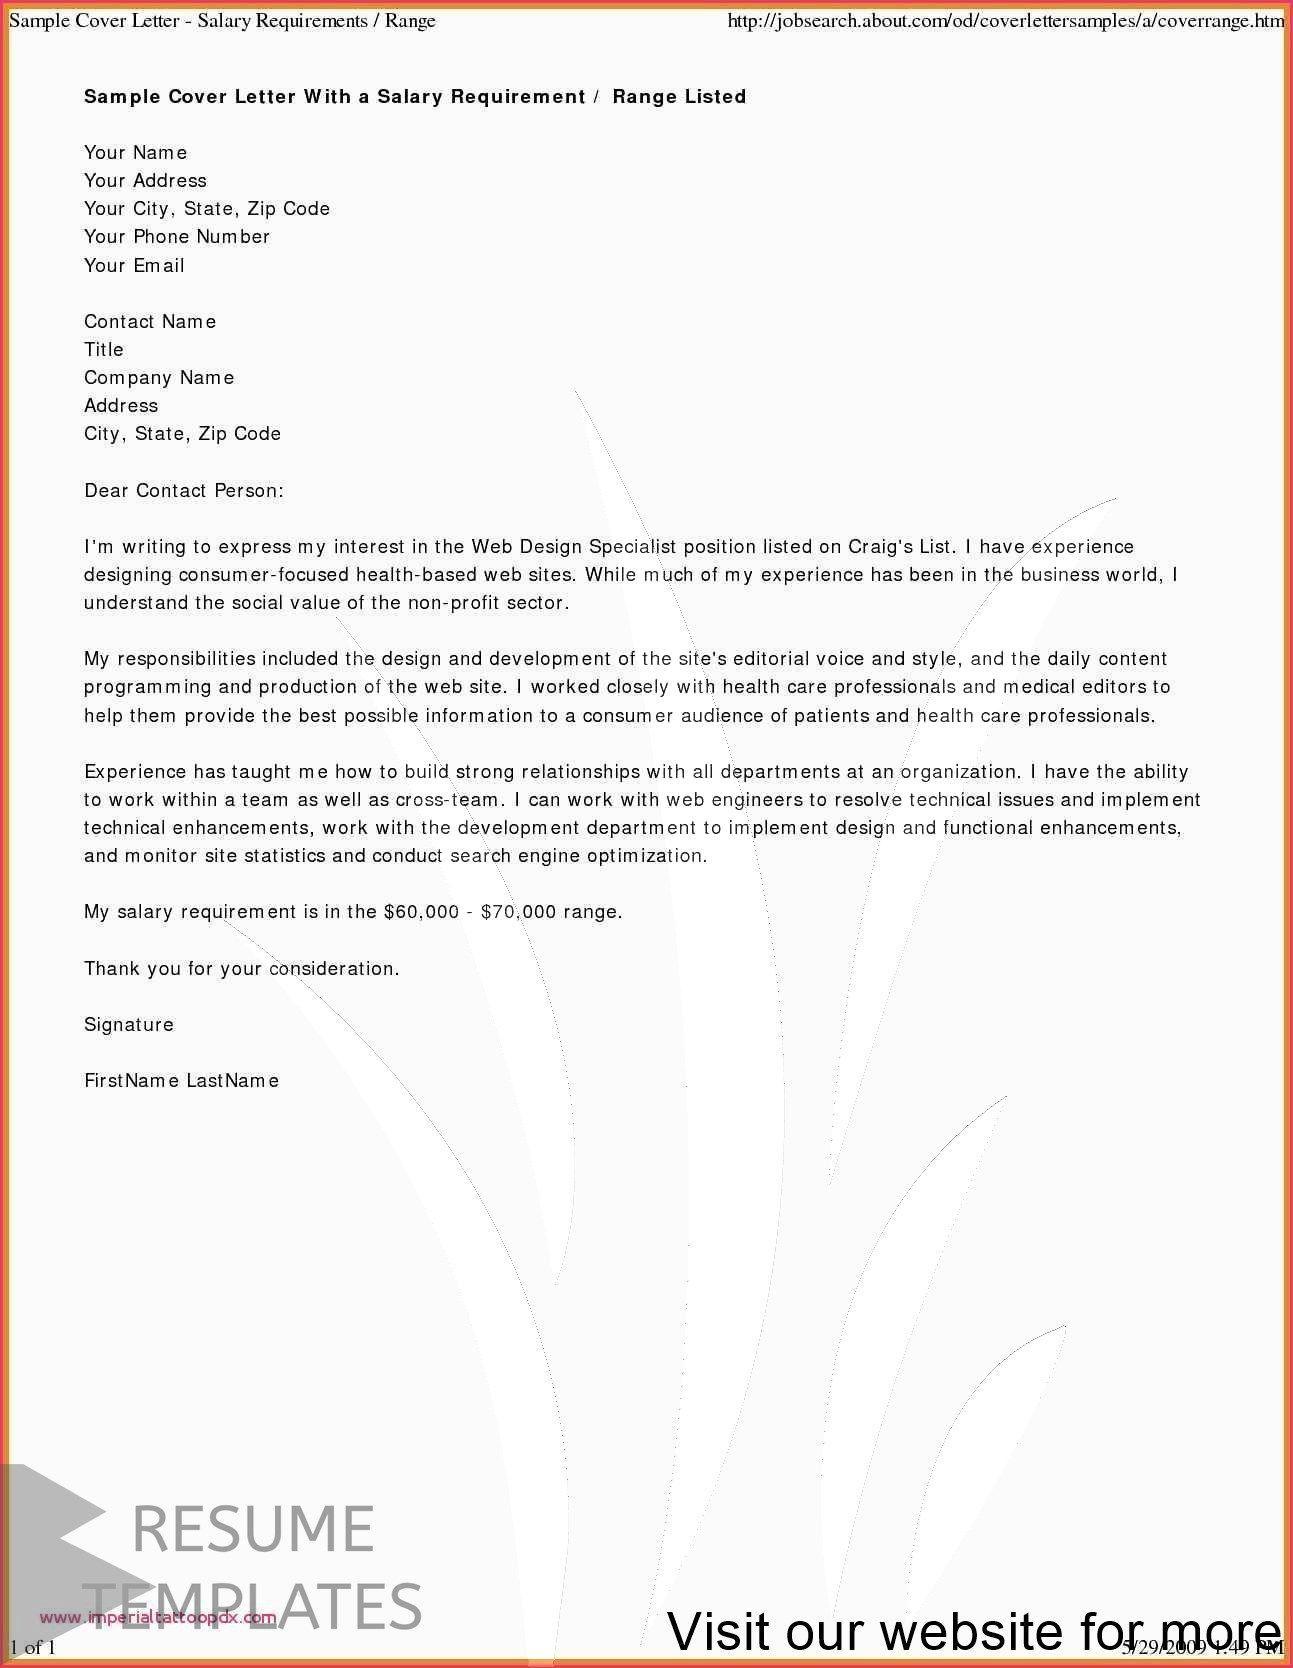 simple resume template australia in 2020 Resume cover